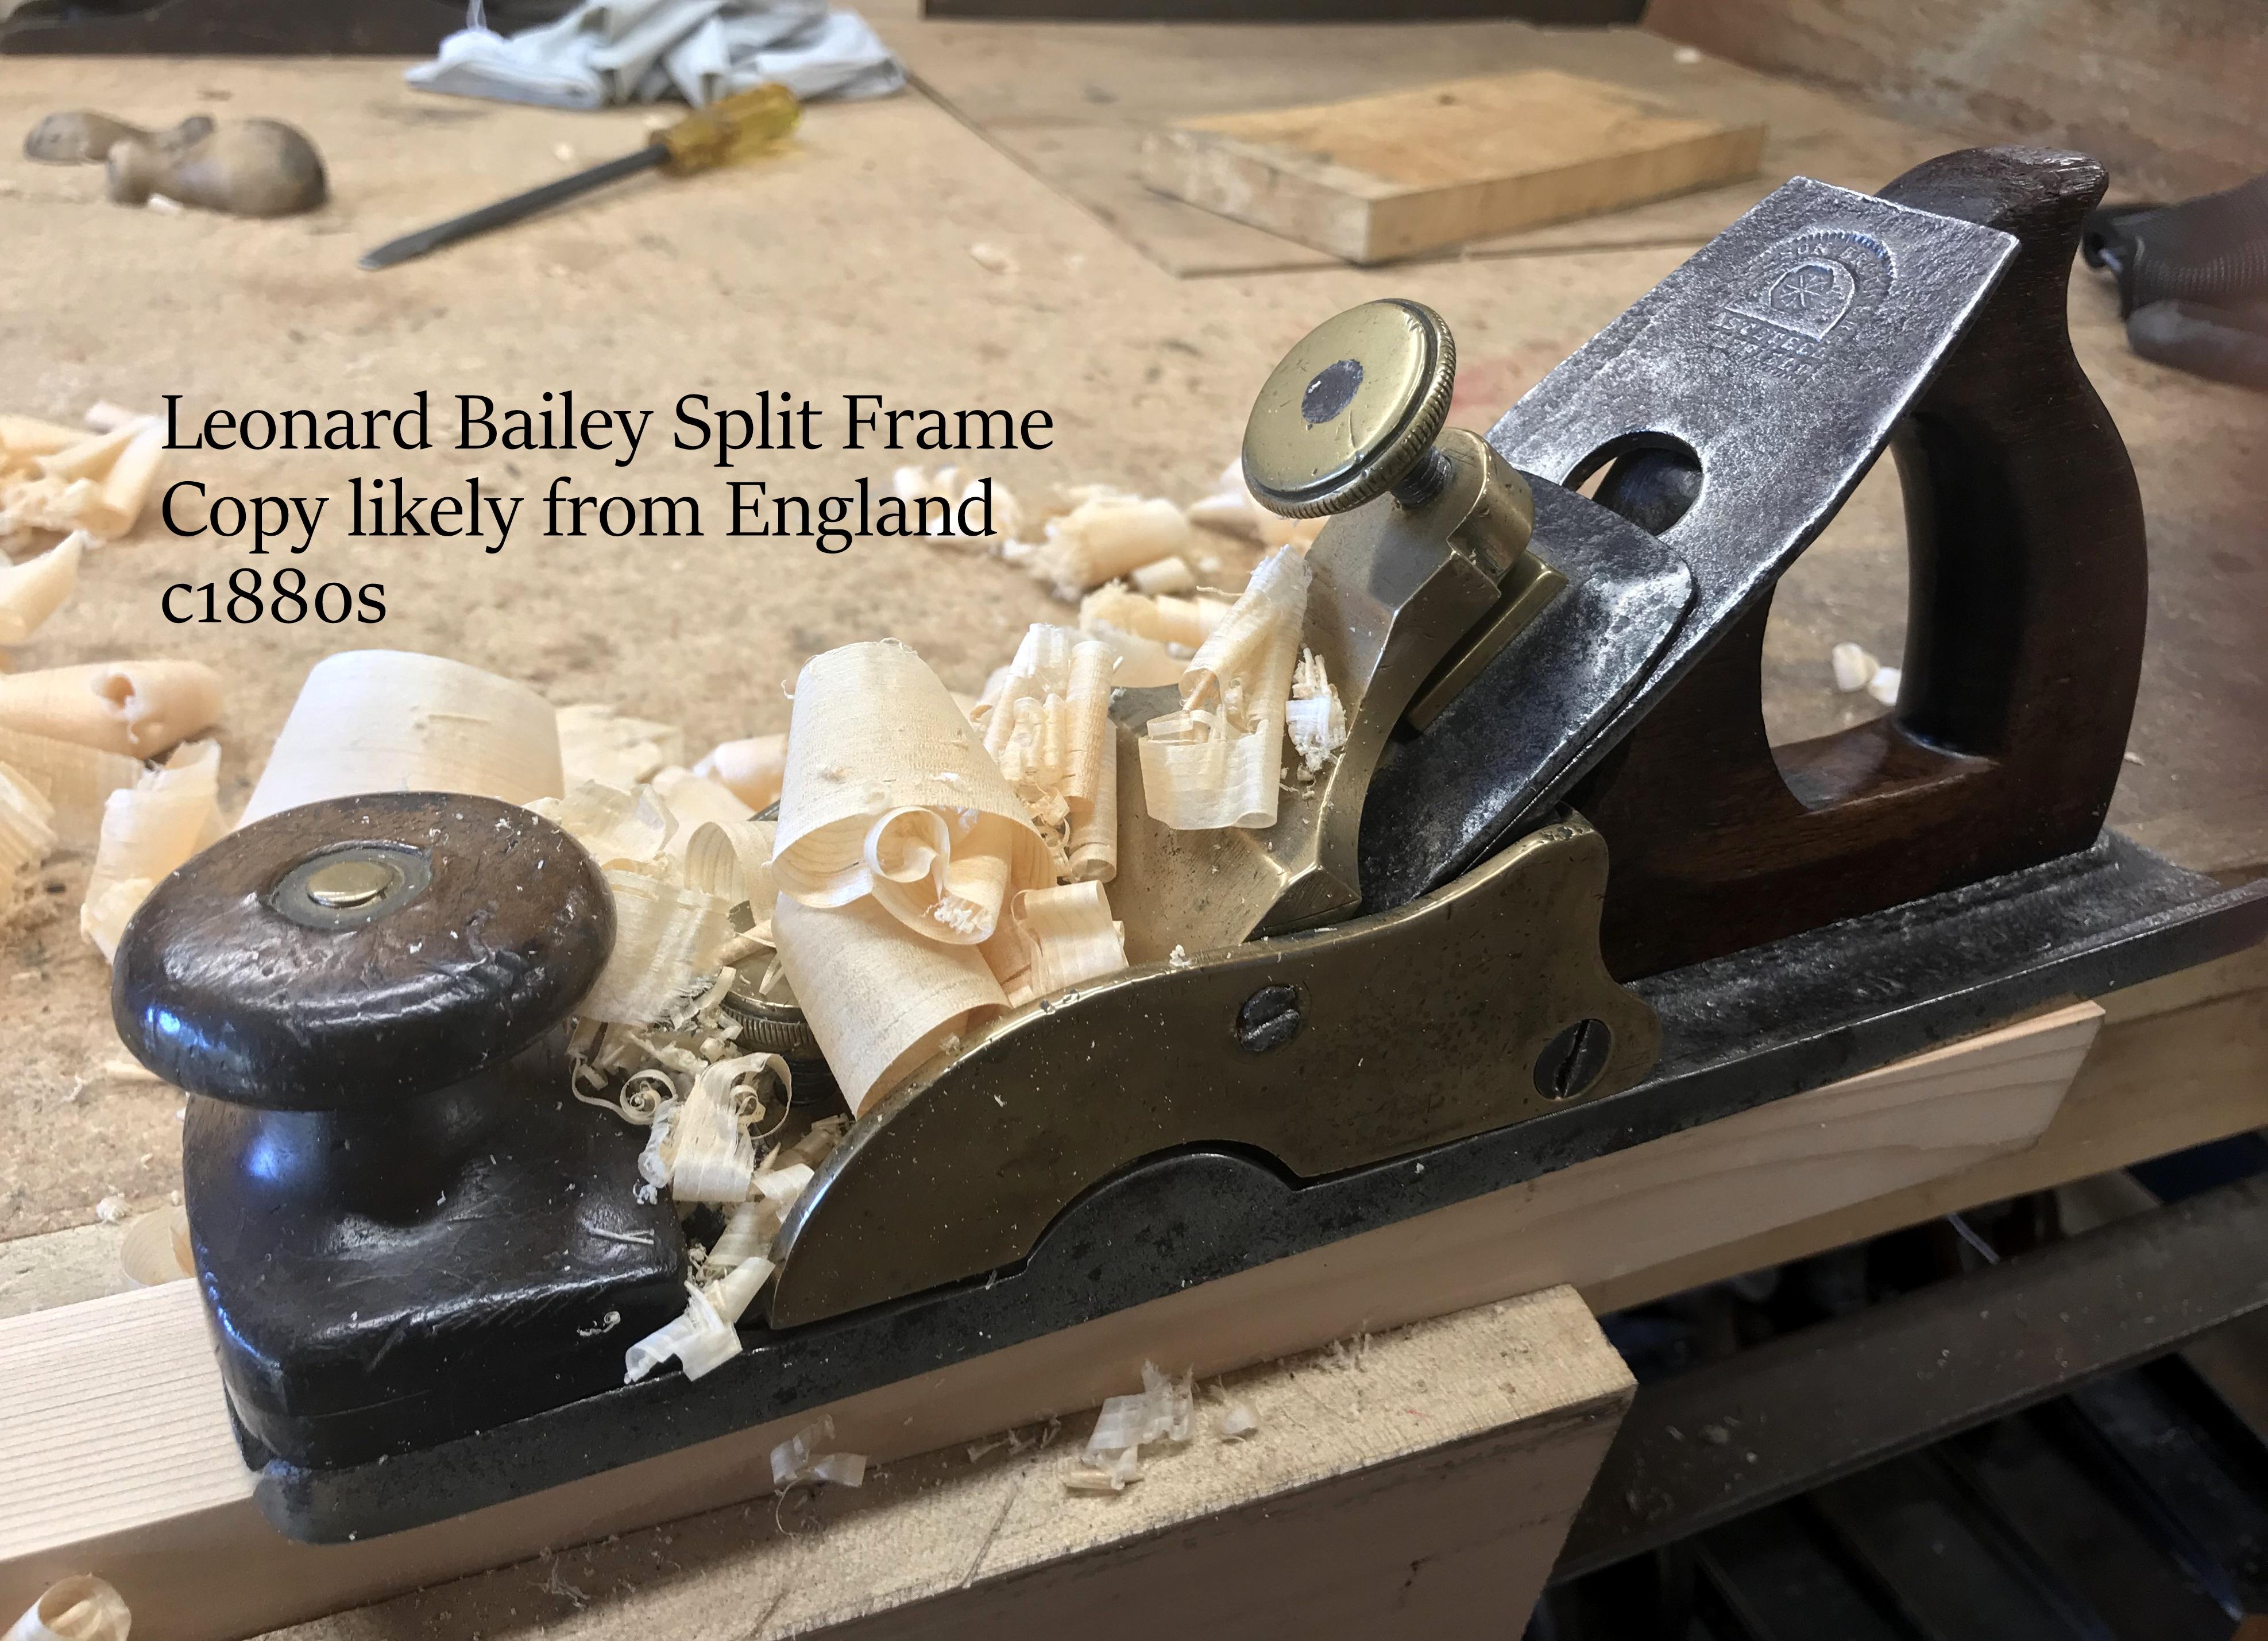 Copy of L. Bailey patent split frame